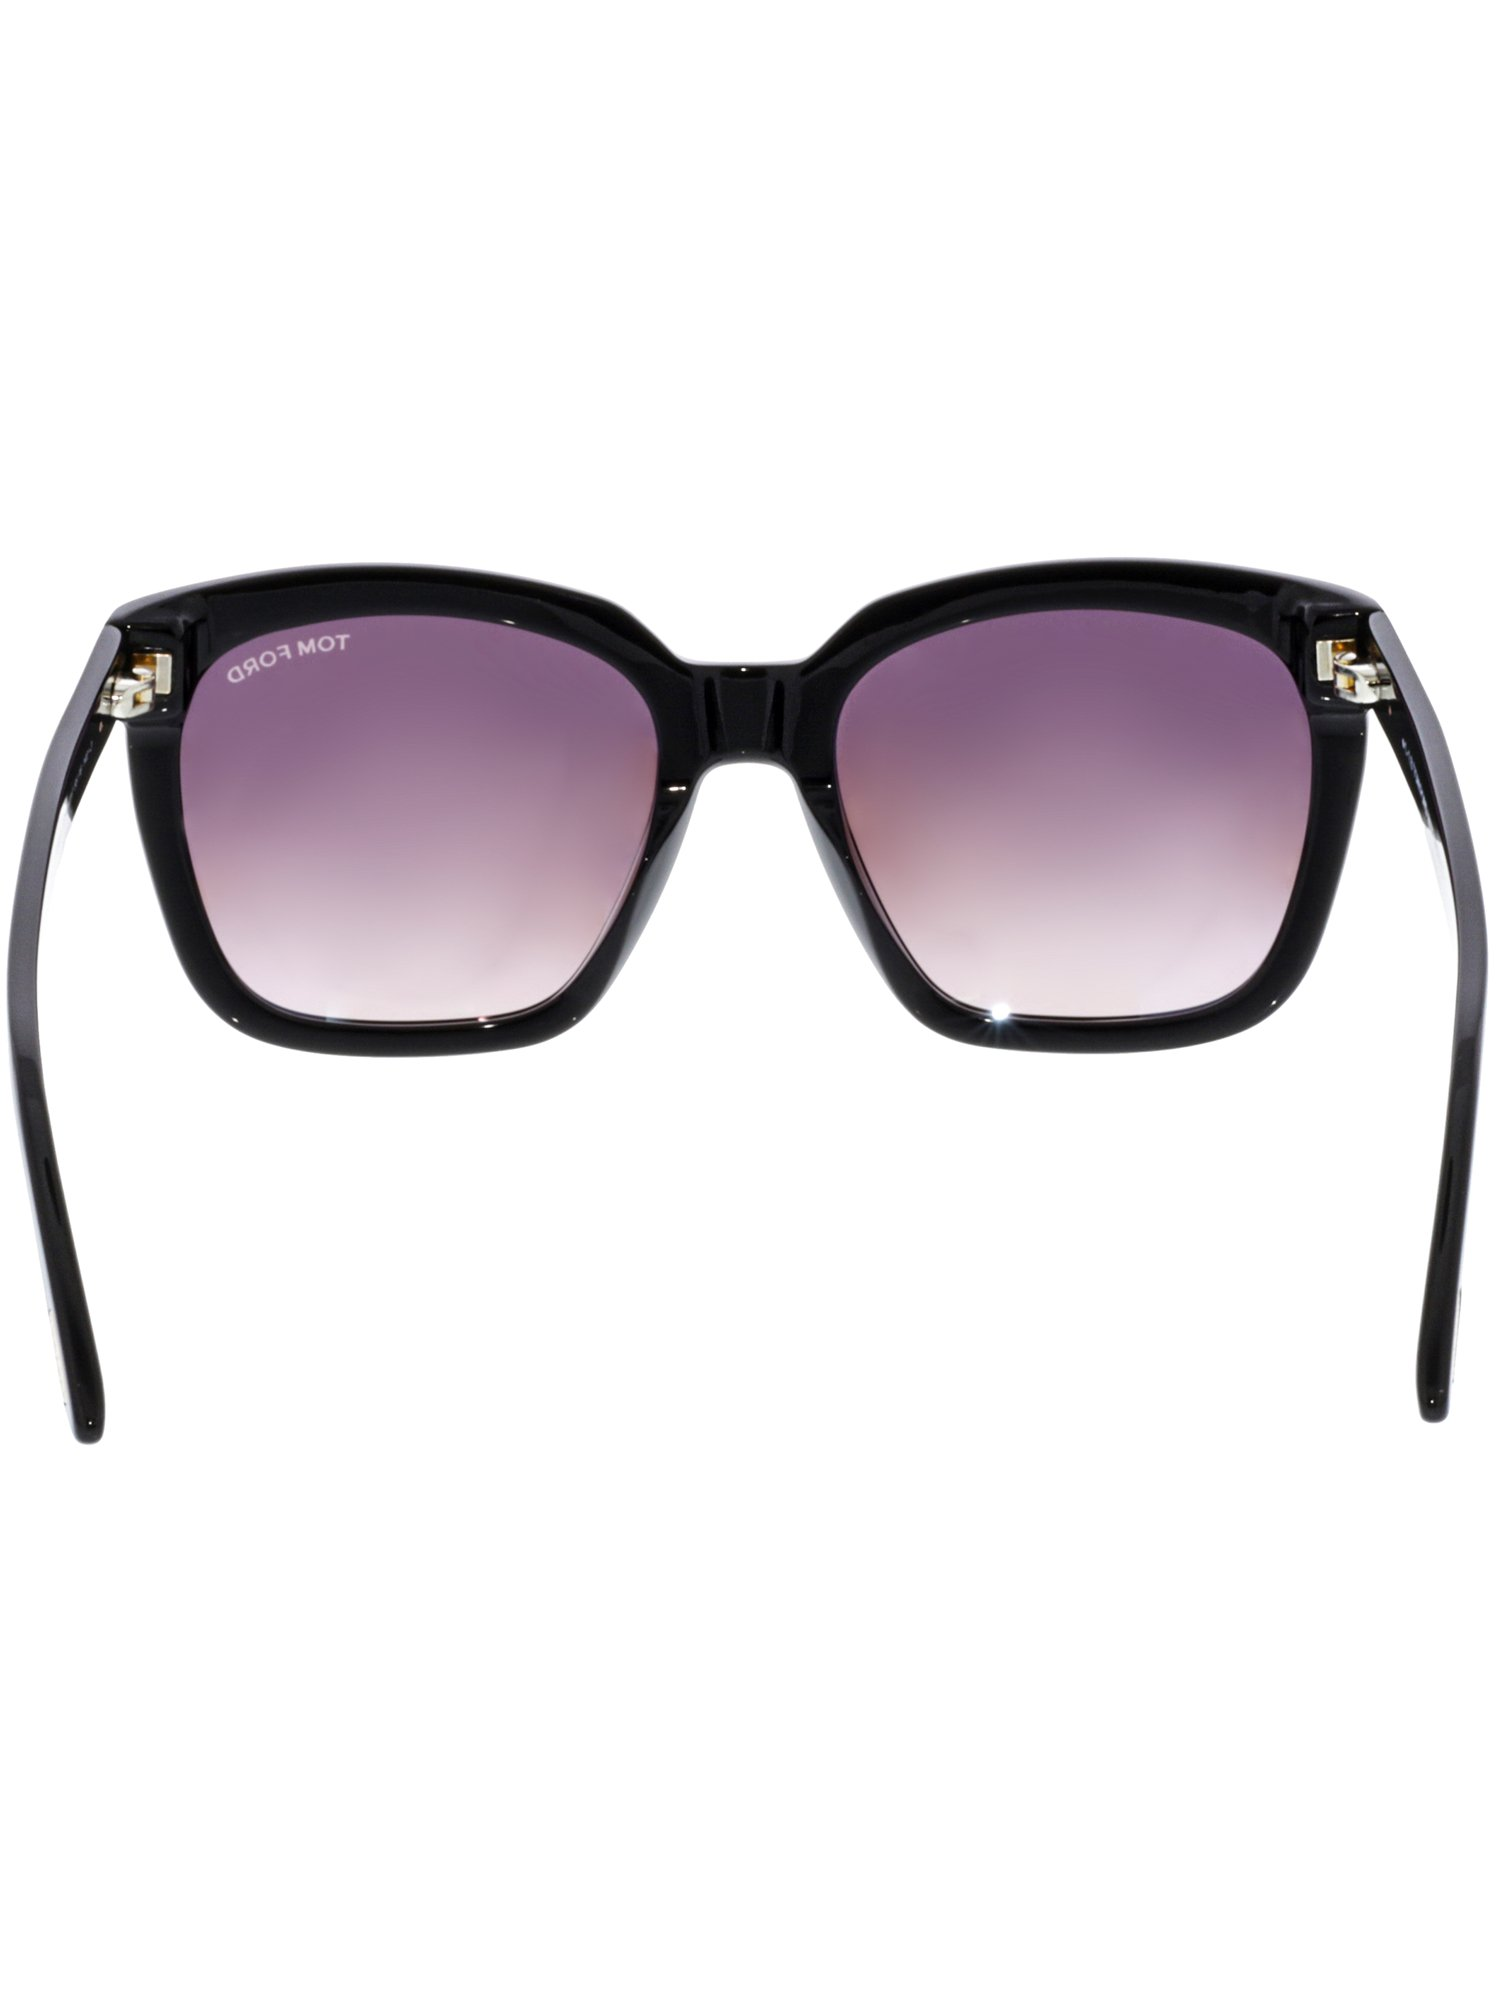 a92a5bccf7 Tom Ford - Women s Gradient Amarra FT0502-01T-55 Black Square Sunglasses -  Walmart.com